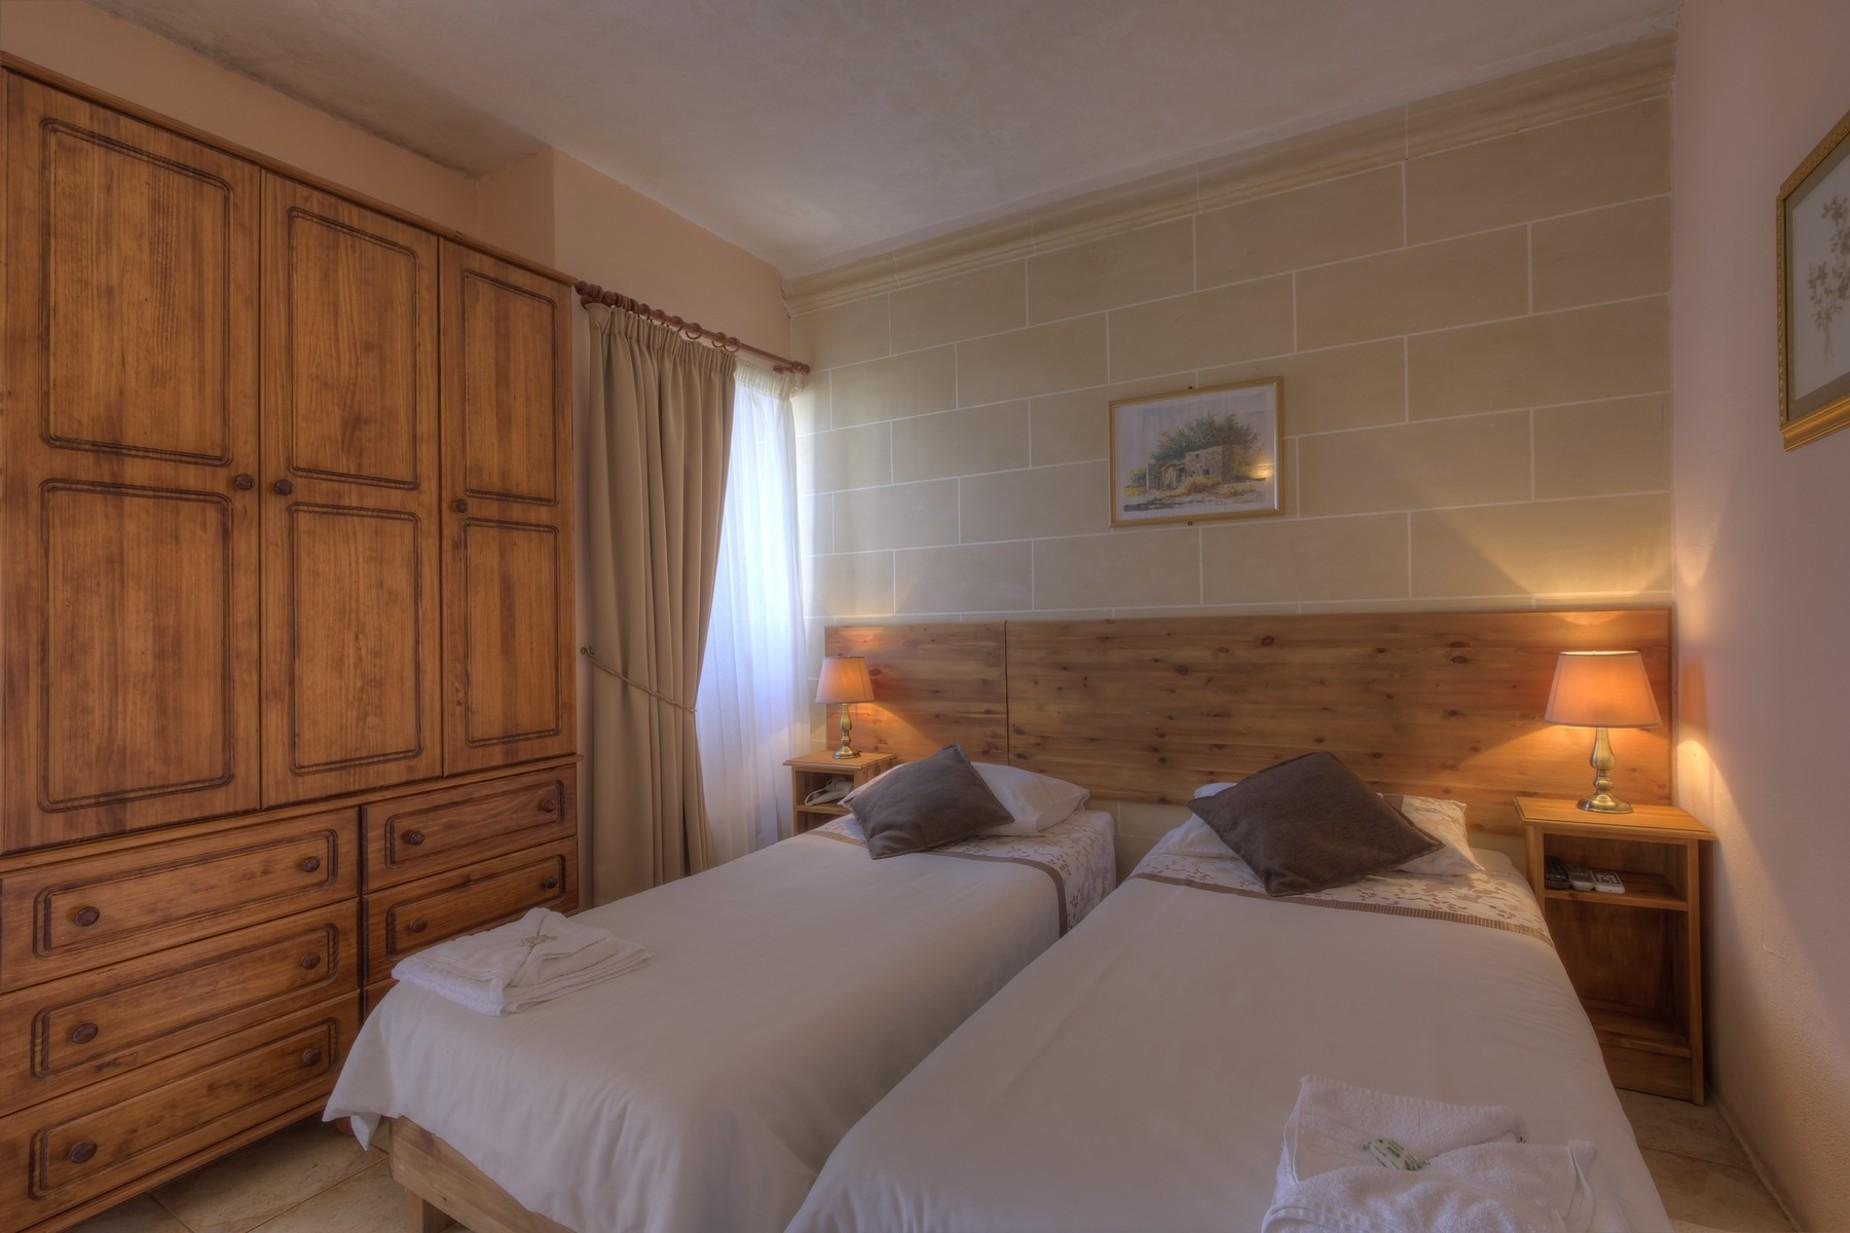 0 bed Hotel For Rent in Swieqi, Swieqi - thumb 10